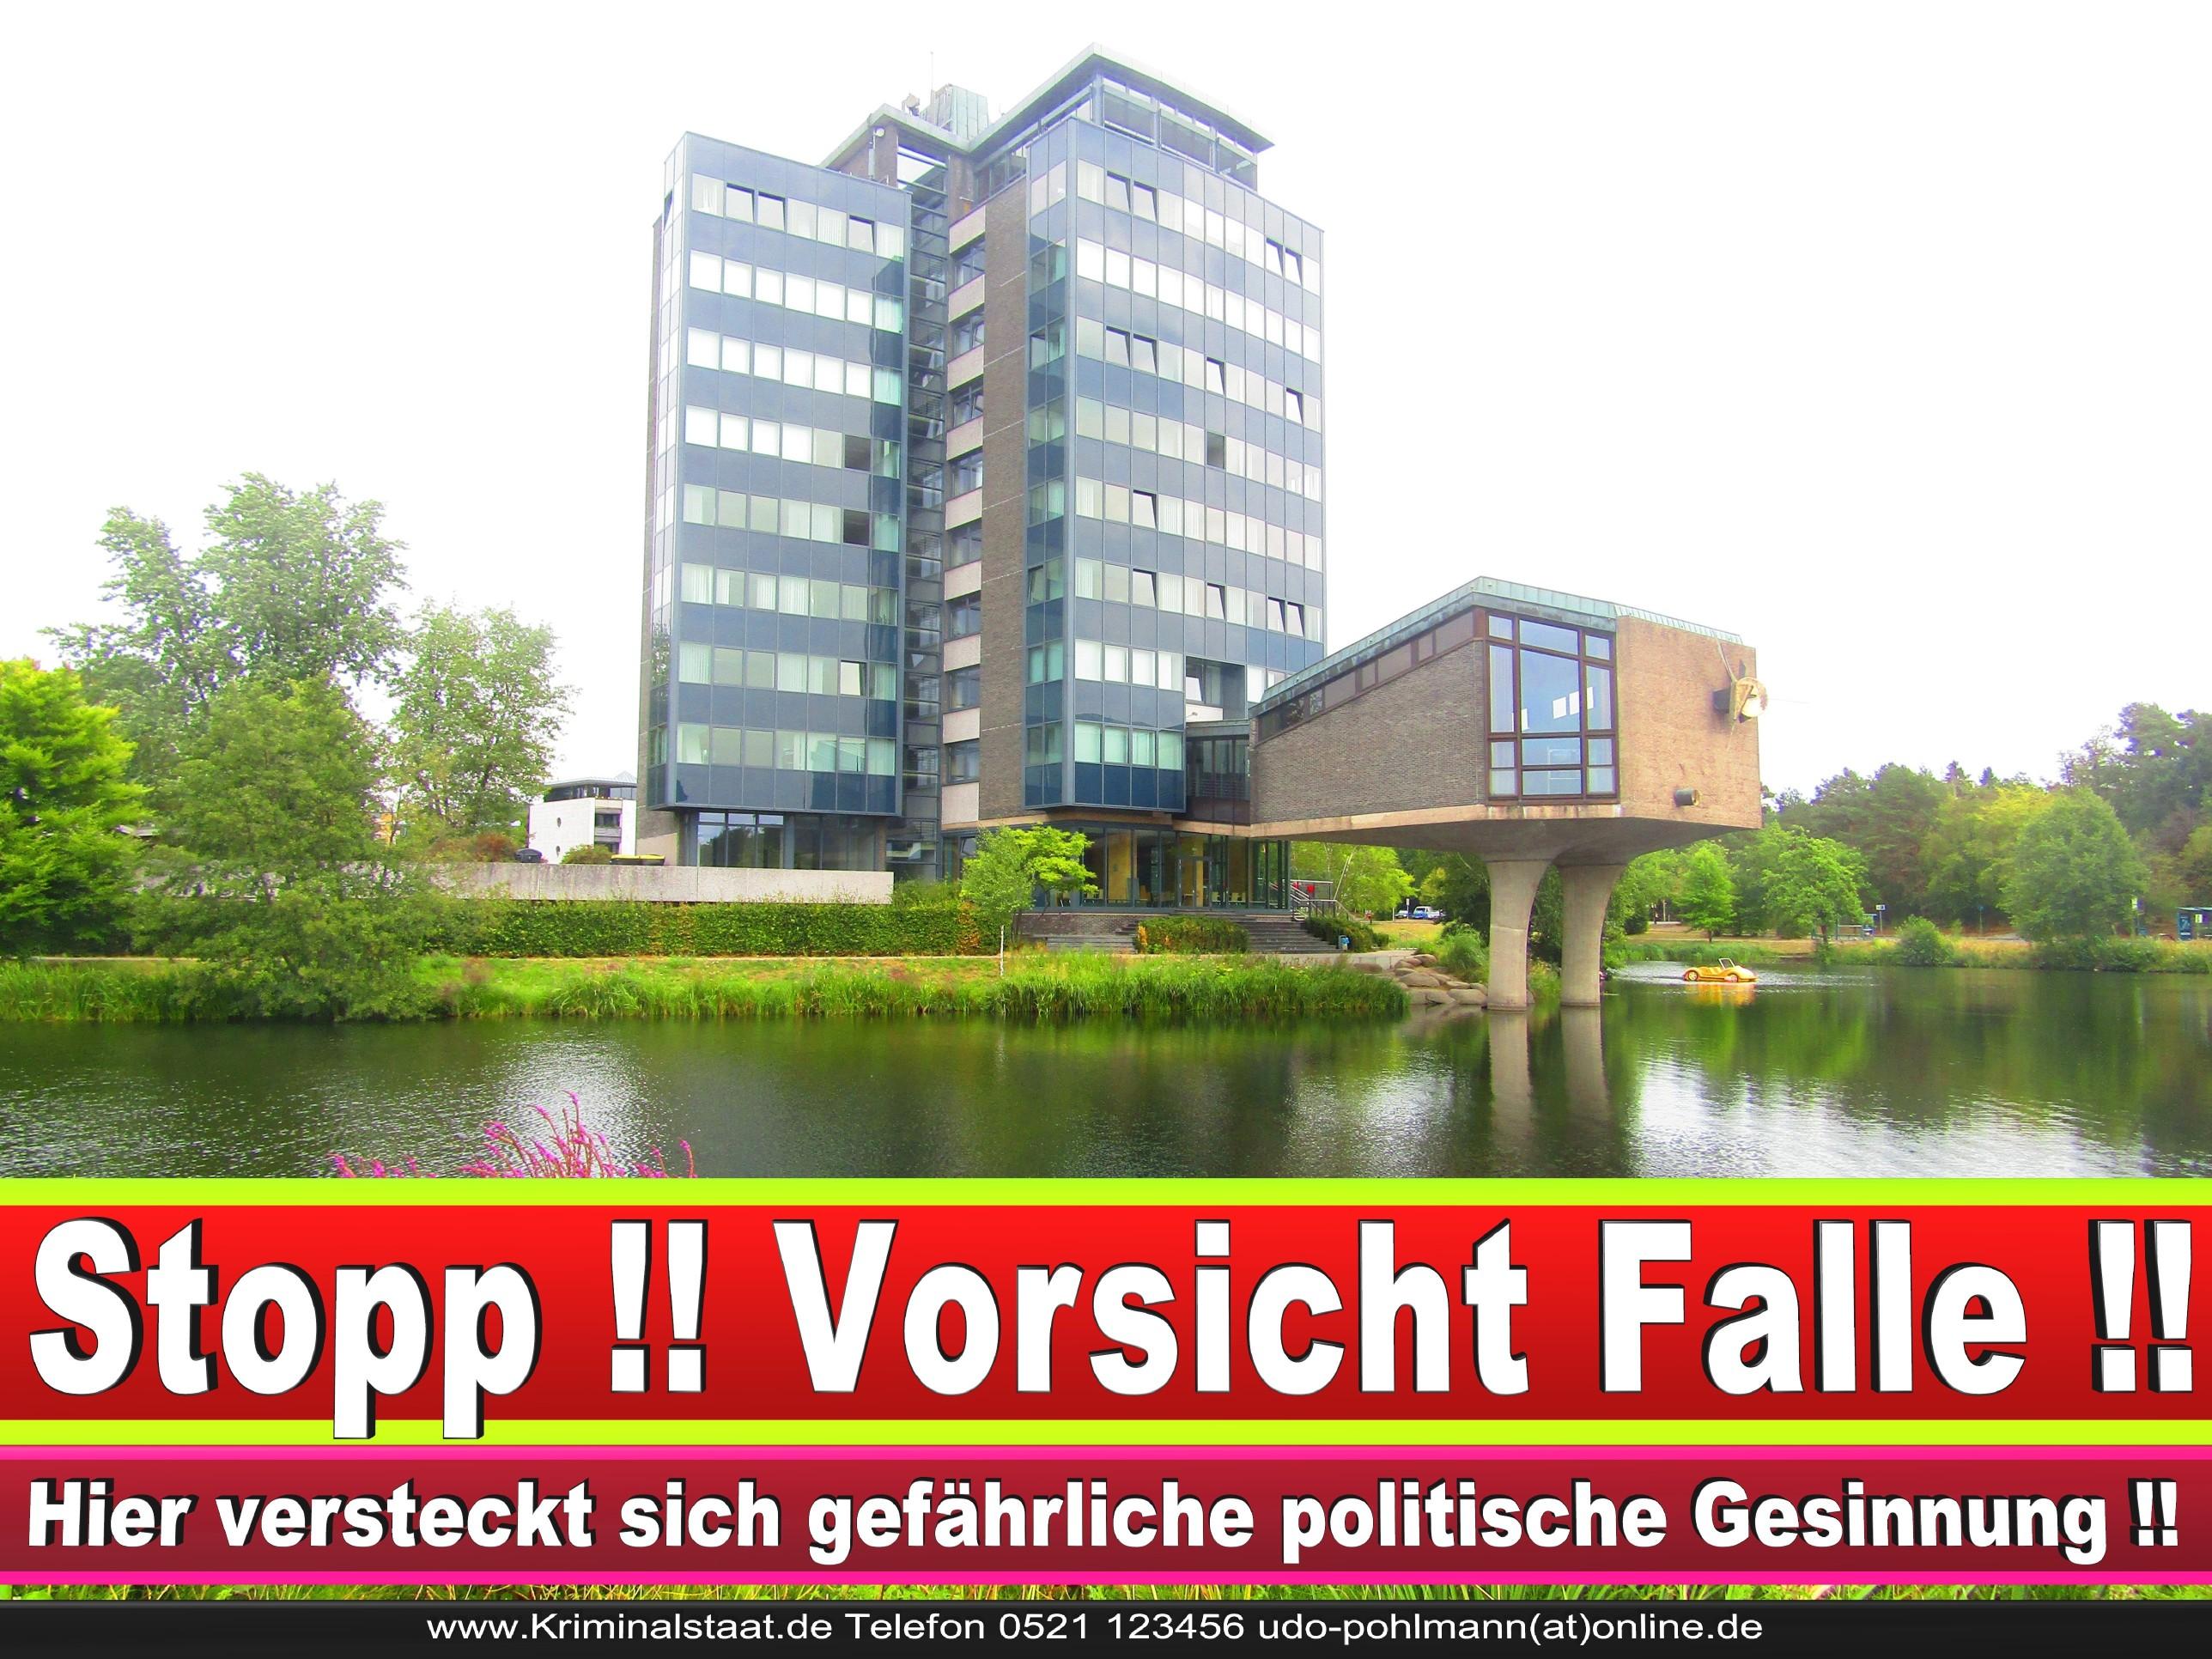 SENNESTADTVEREIN CDU BIELEFELD 5 LANDTAGSWAHL BUNDESTAGSWAHL BÜRGERMEISTERWAHL